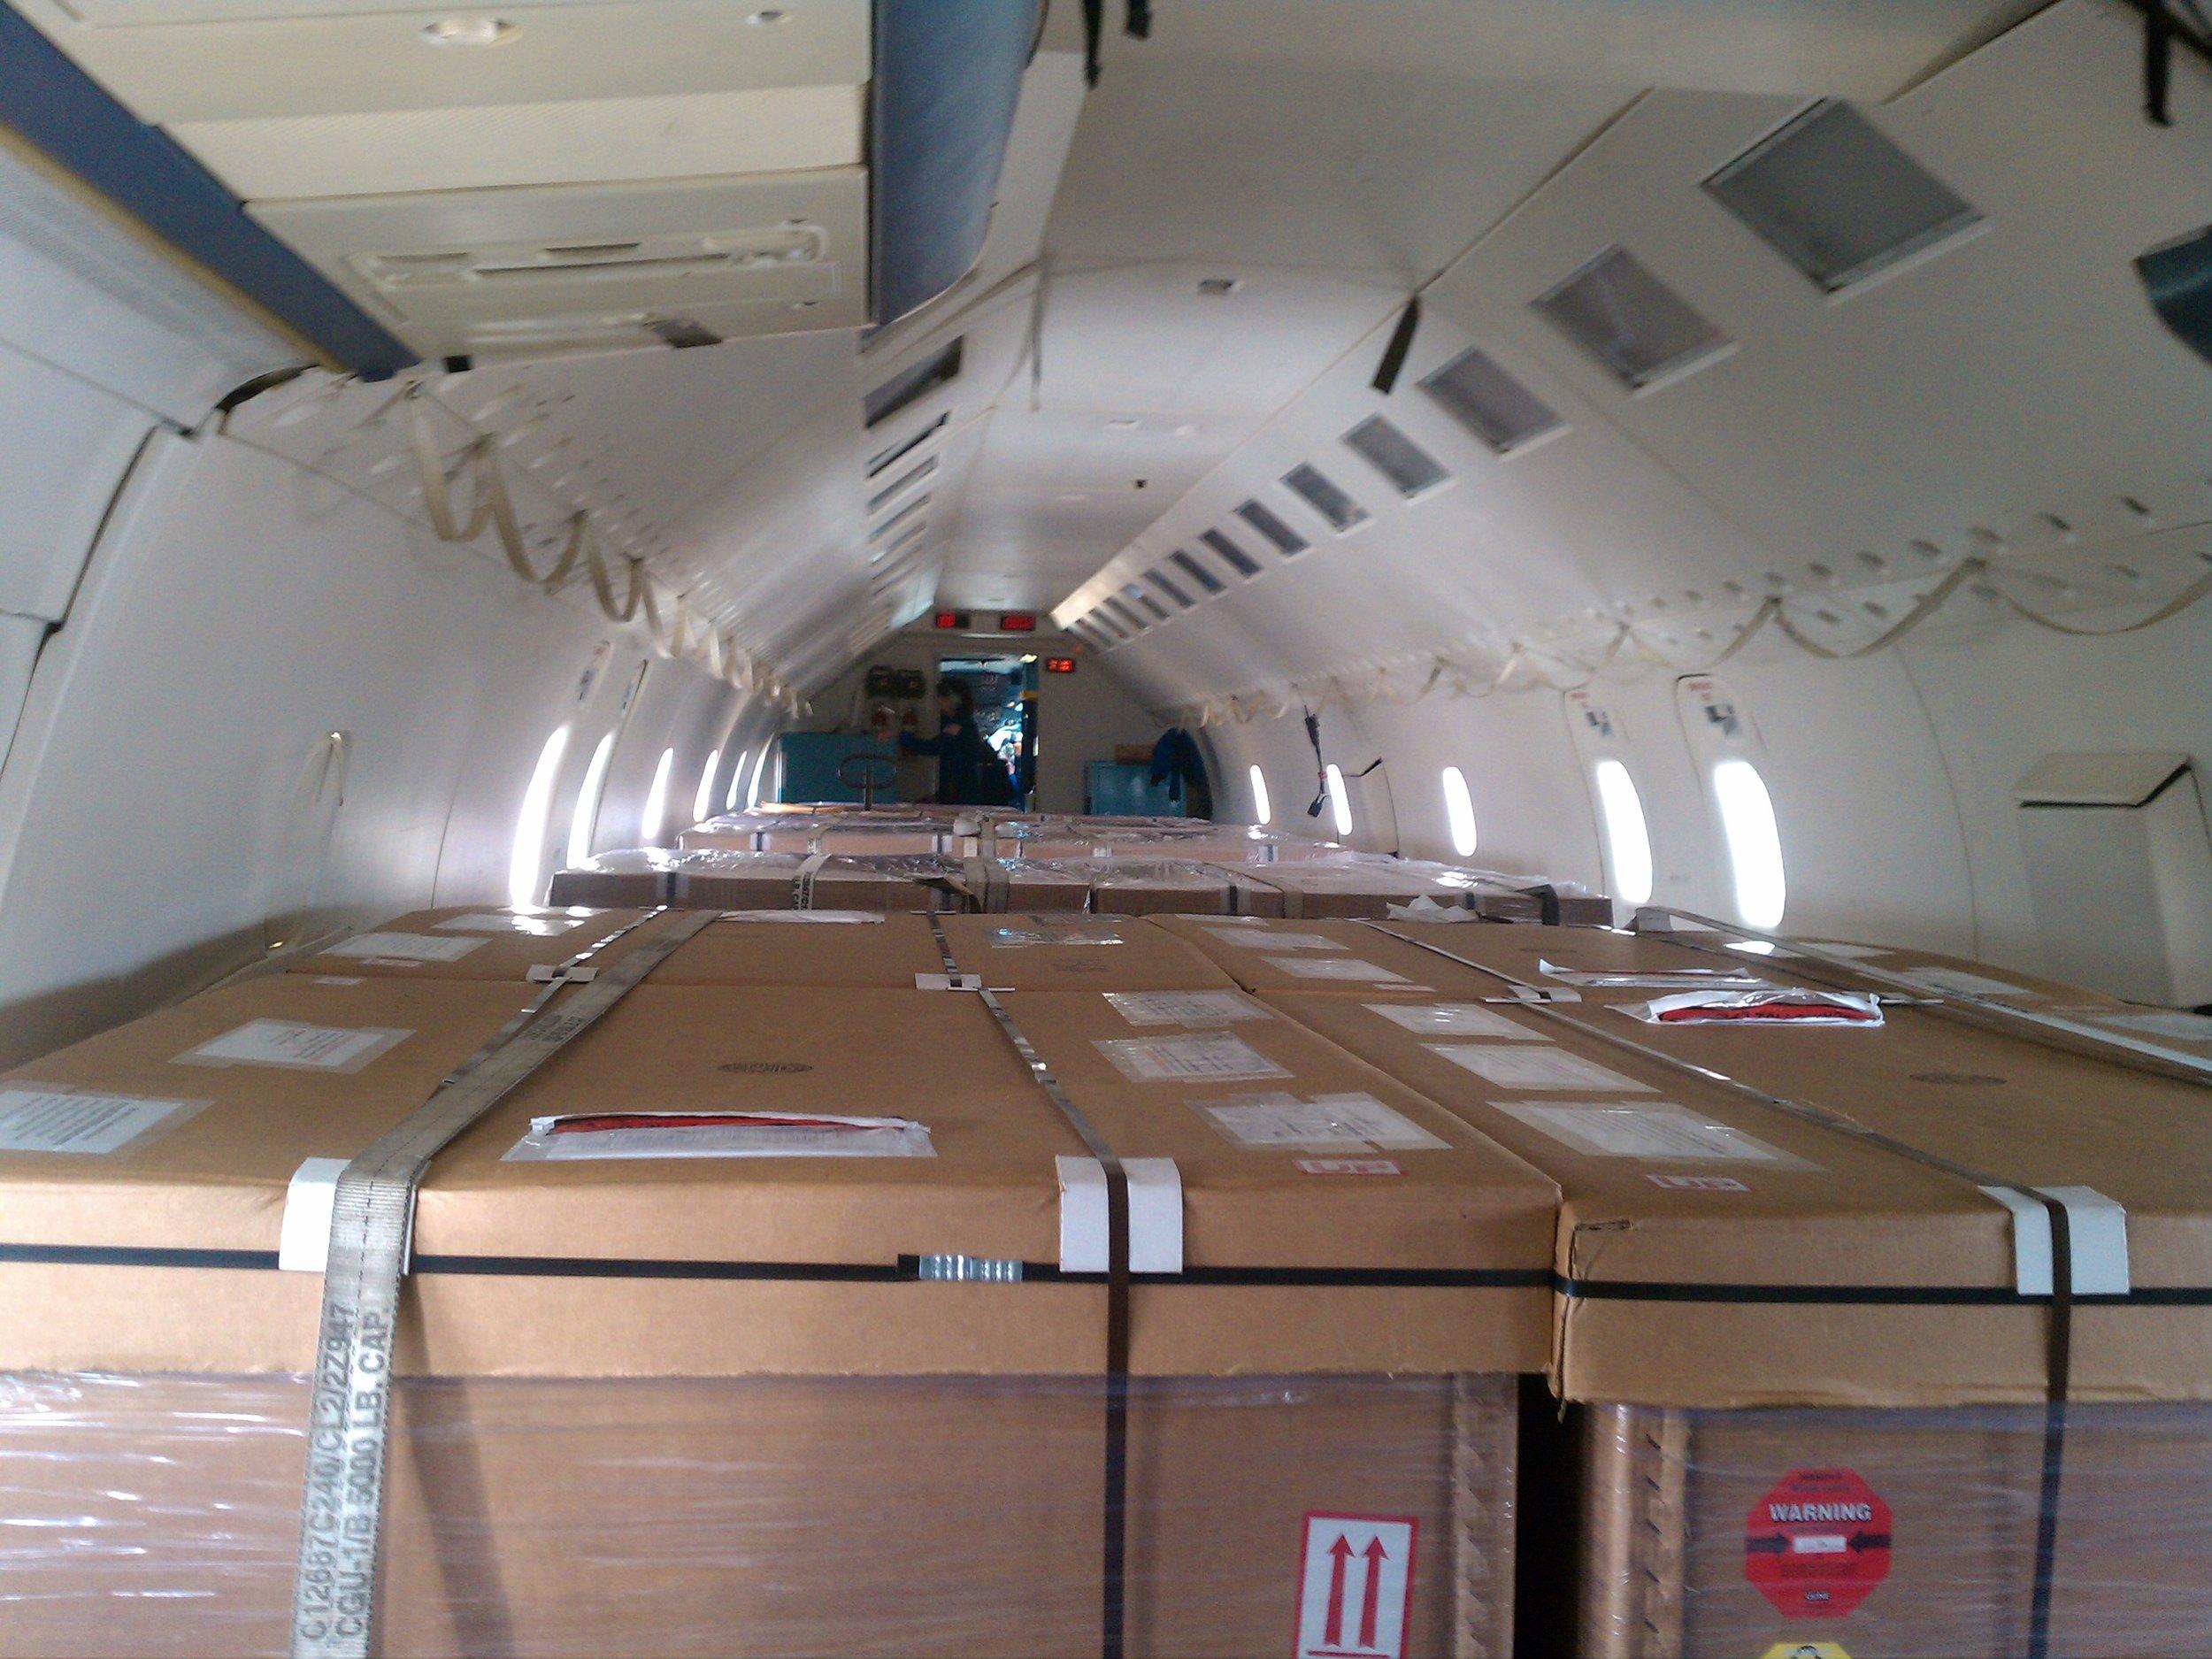 ISS Resupply Cargo